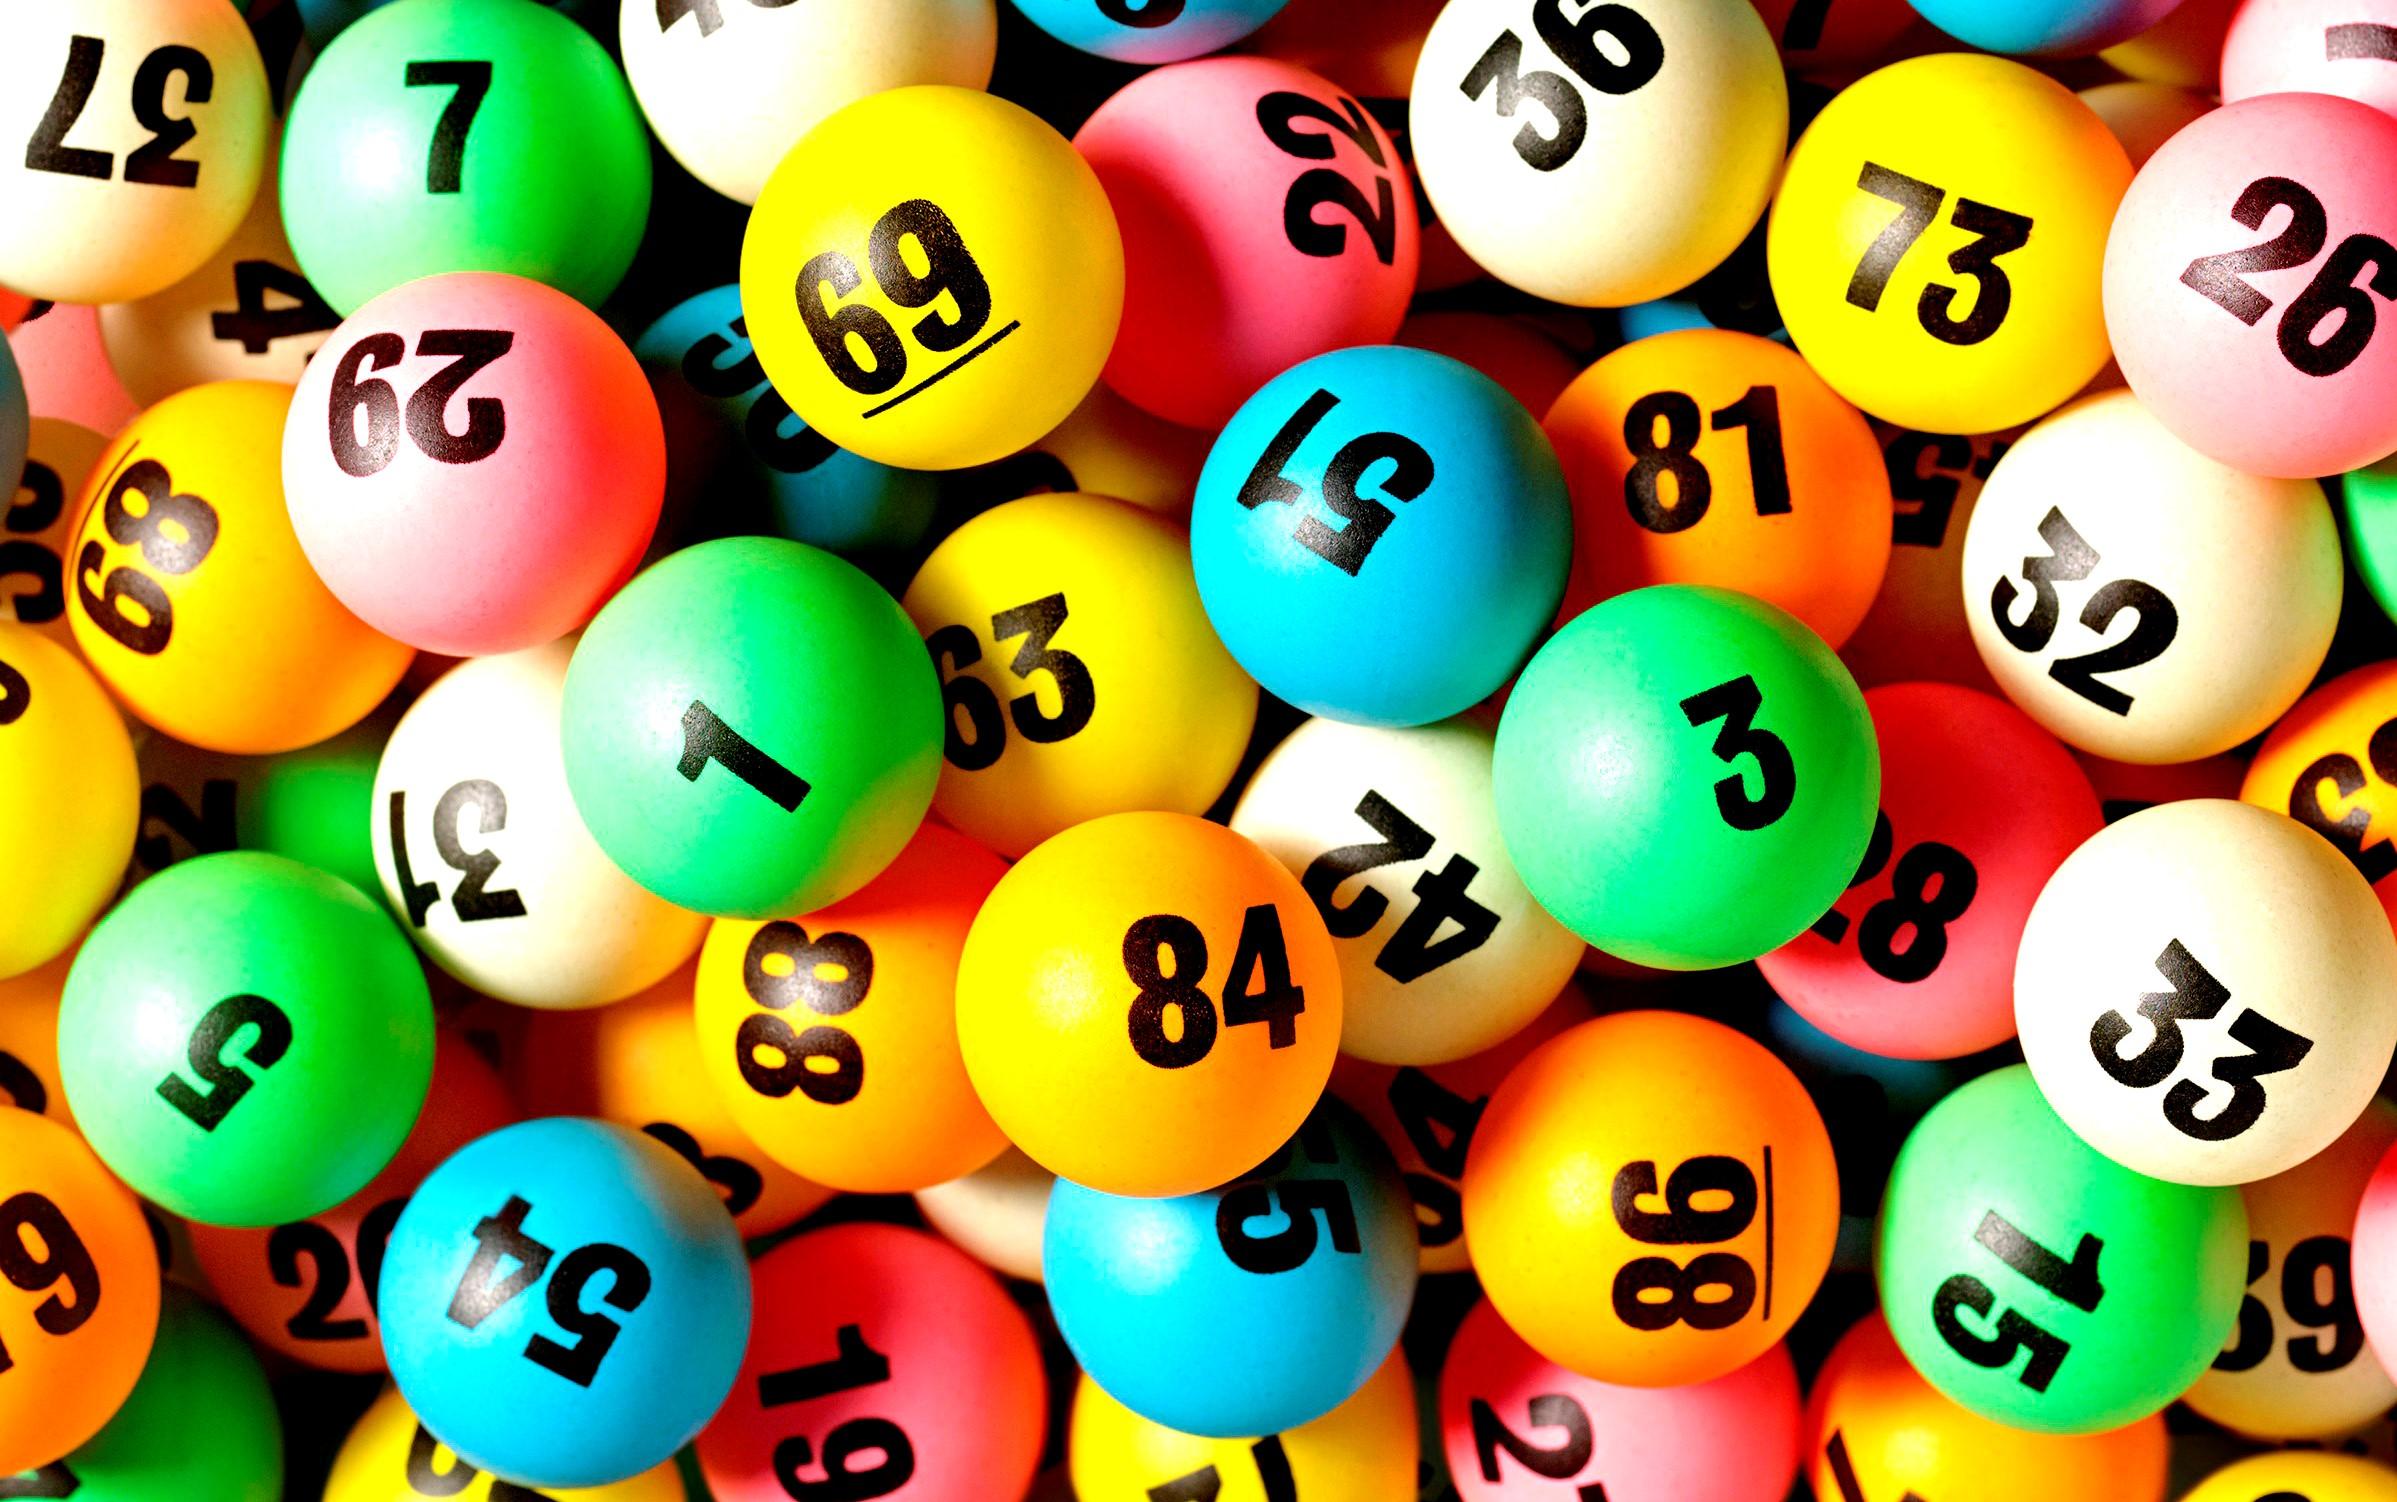 Madness casino Brasil loteria 379188